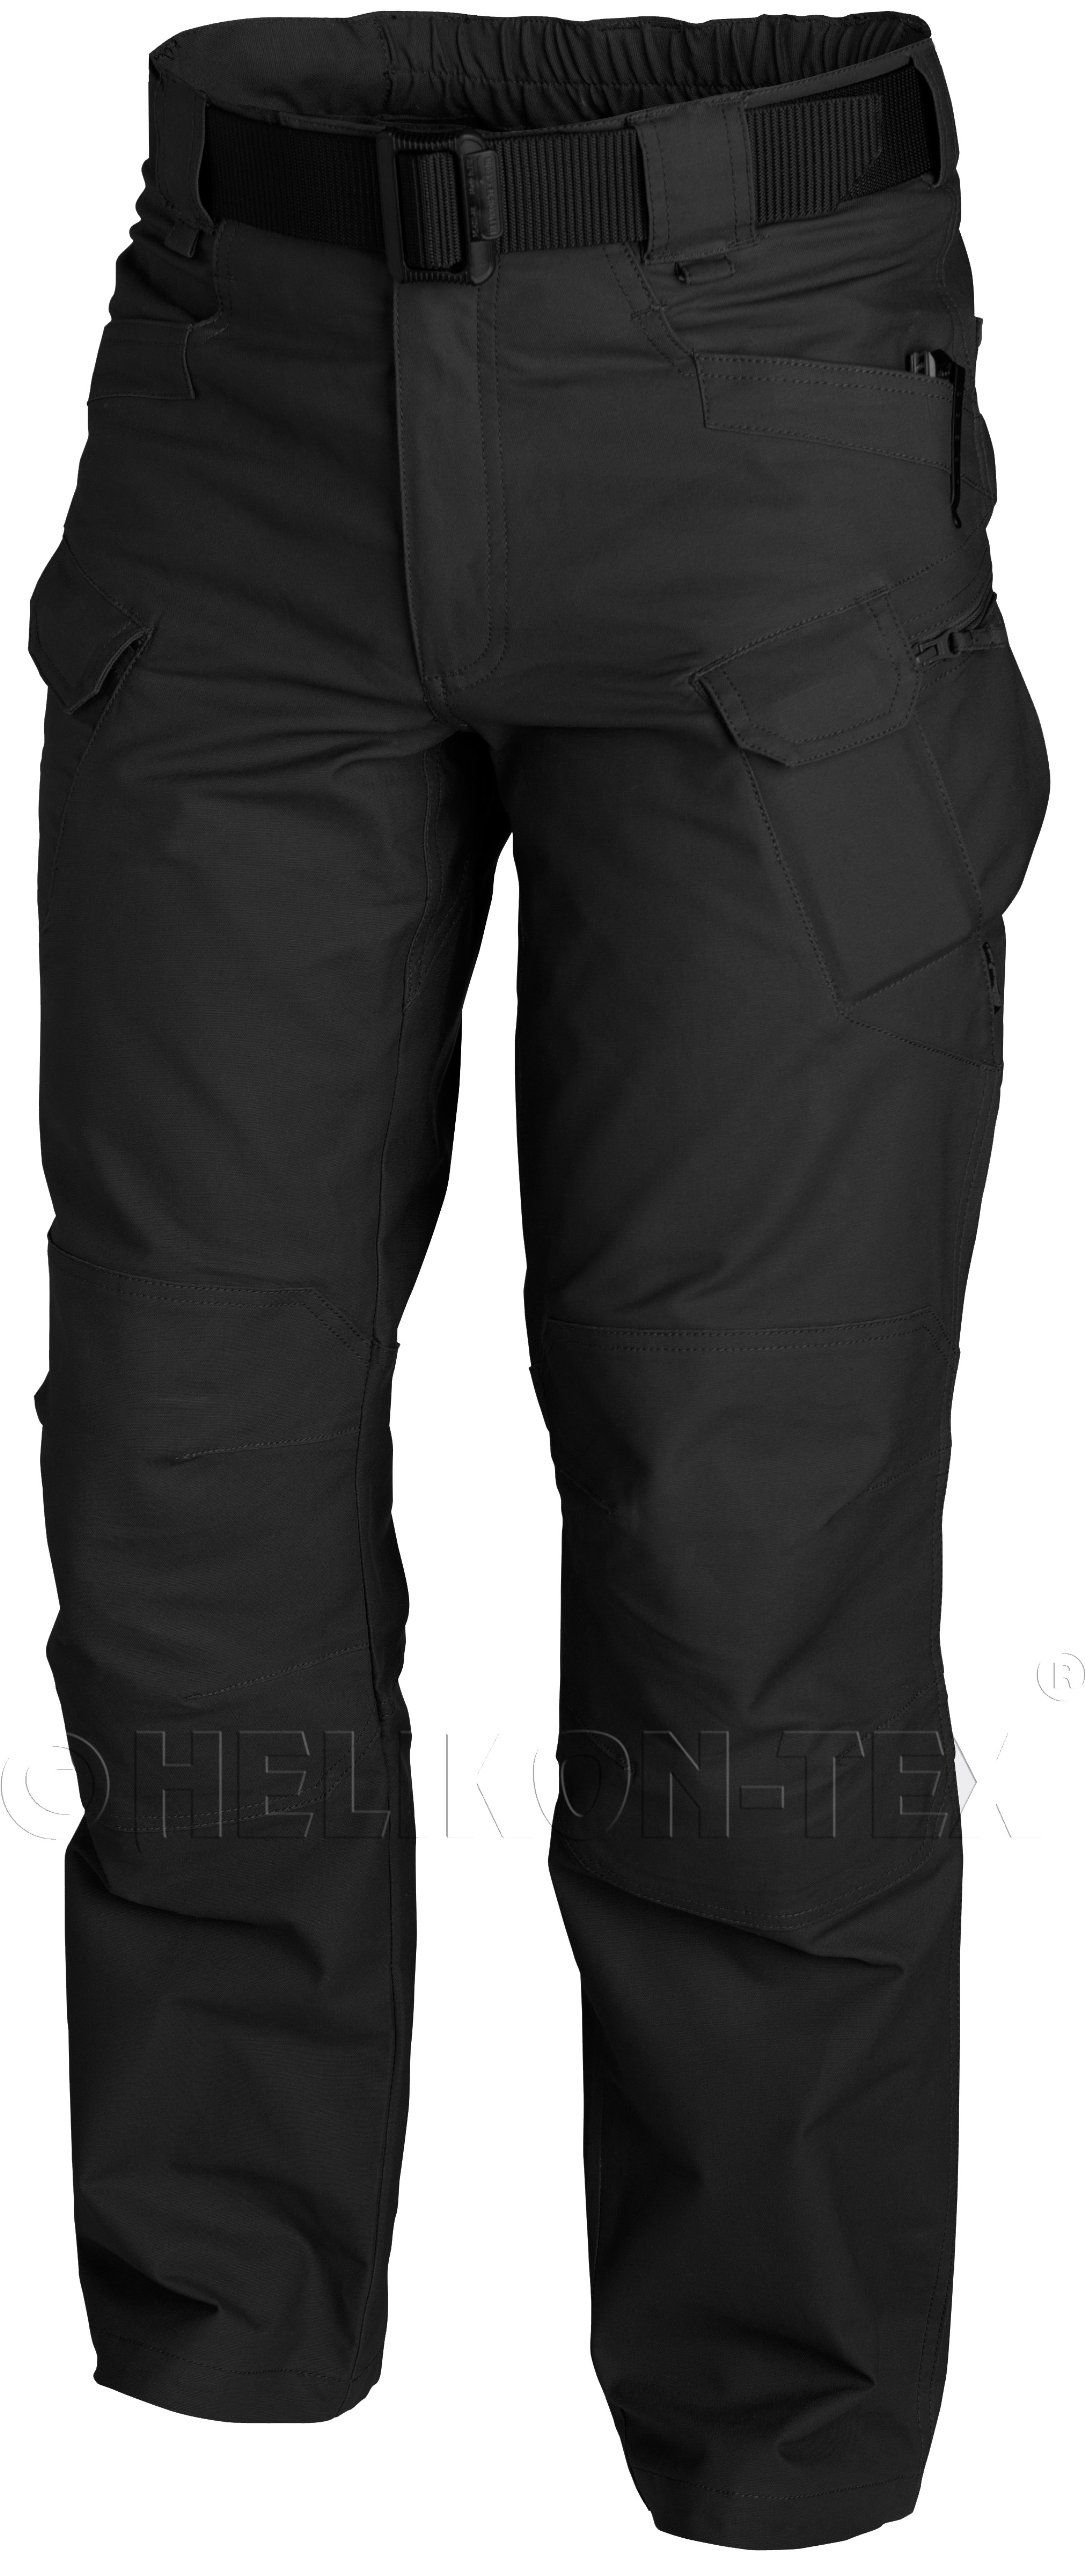 Helikon Tex Utp Urban Tactical Pants Hose Canvas Schwarz S Xlong Tactico Ropa Tactica Pantalones De Hombre Moda Y Ropa Militar